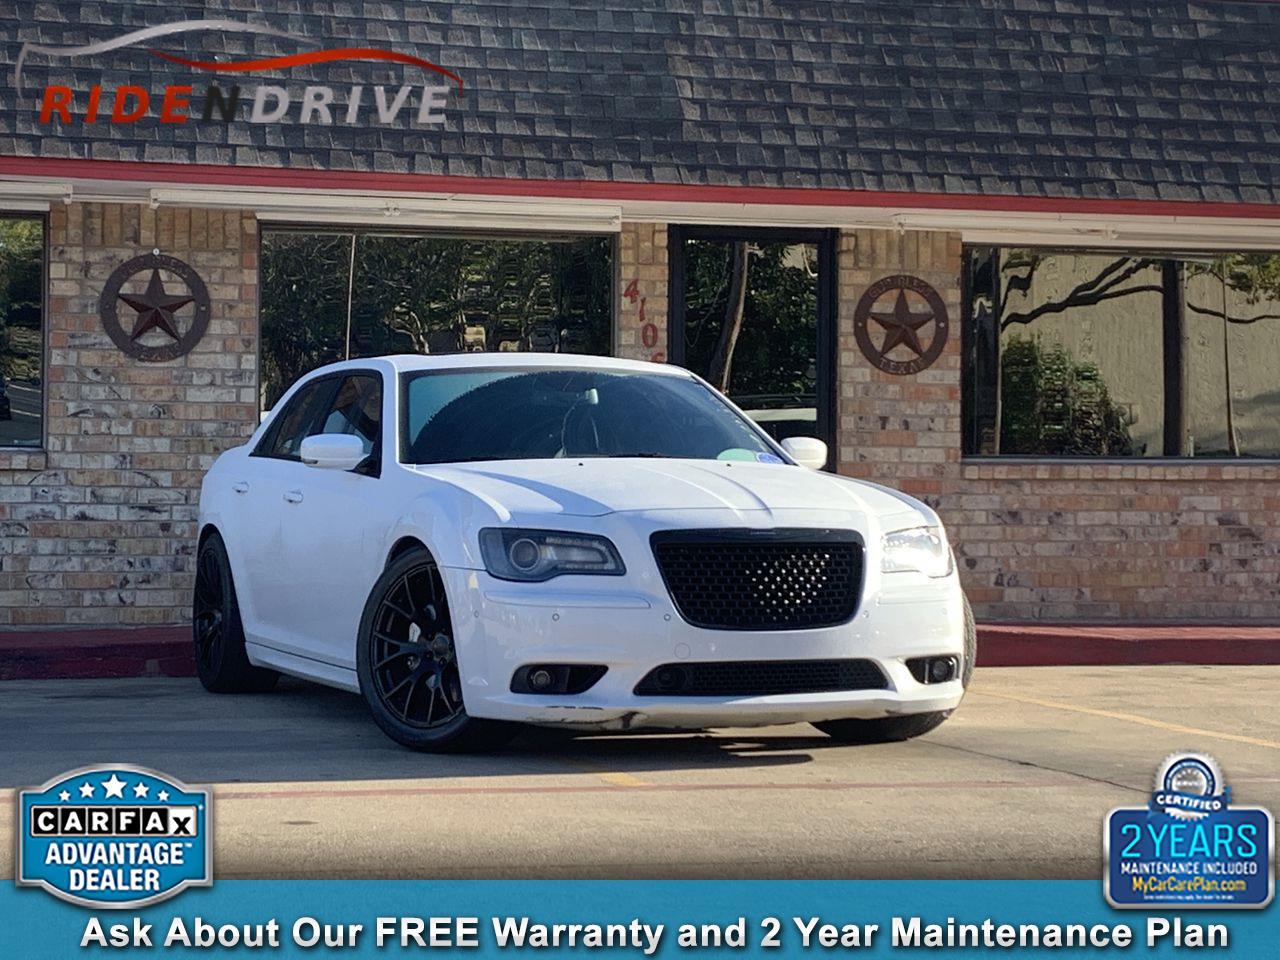 2012 Chrysler 300 4dr Sdn V8 SRT8 RWD